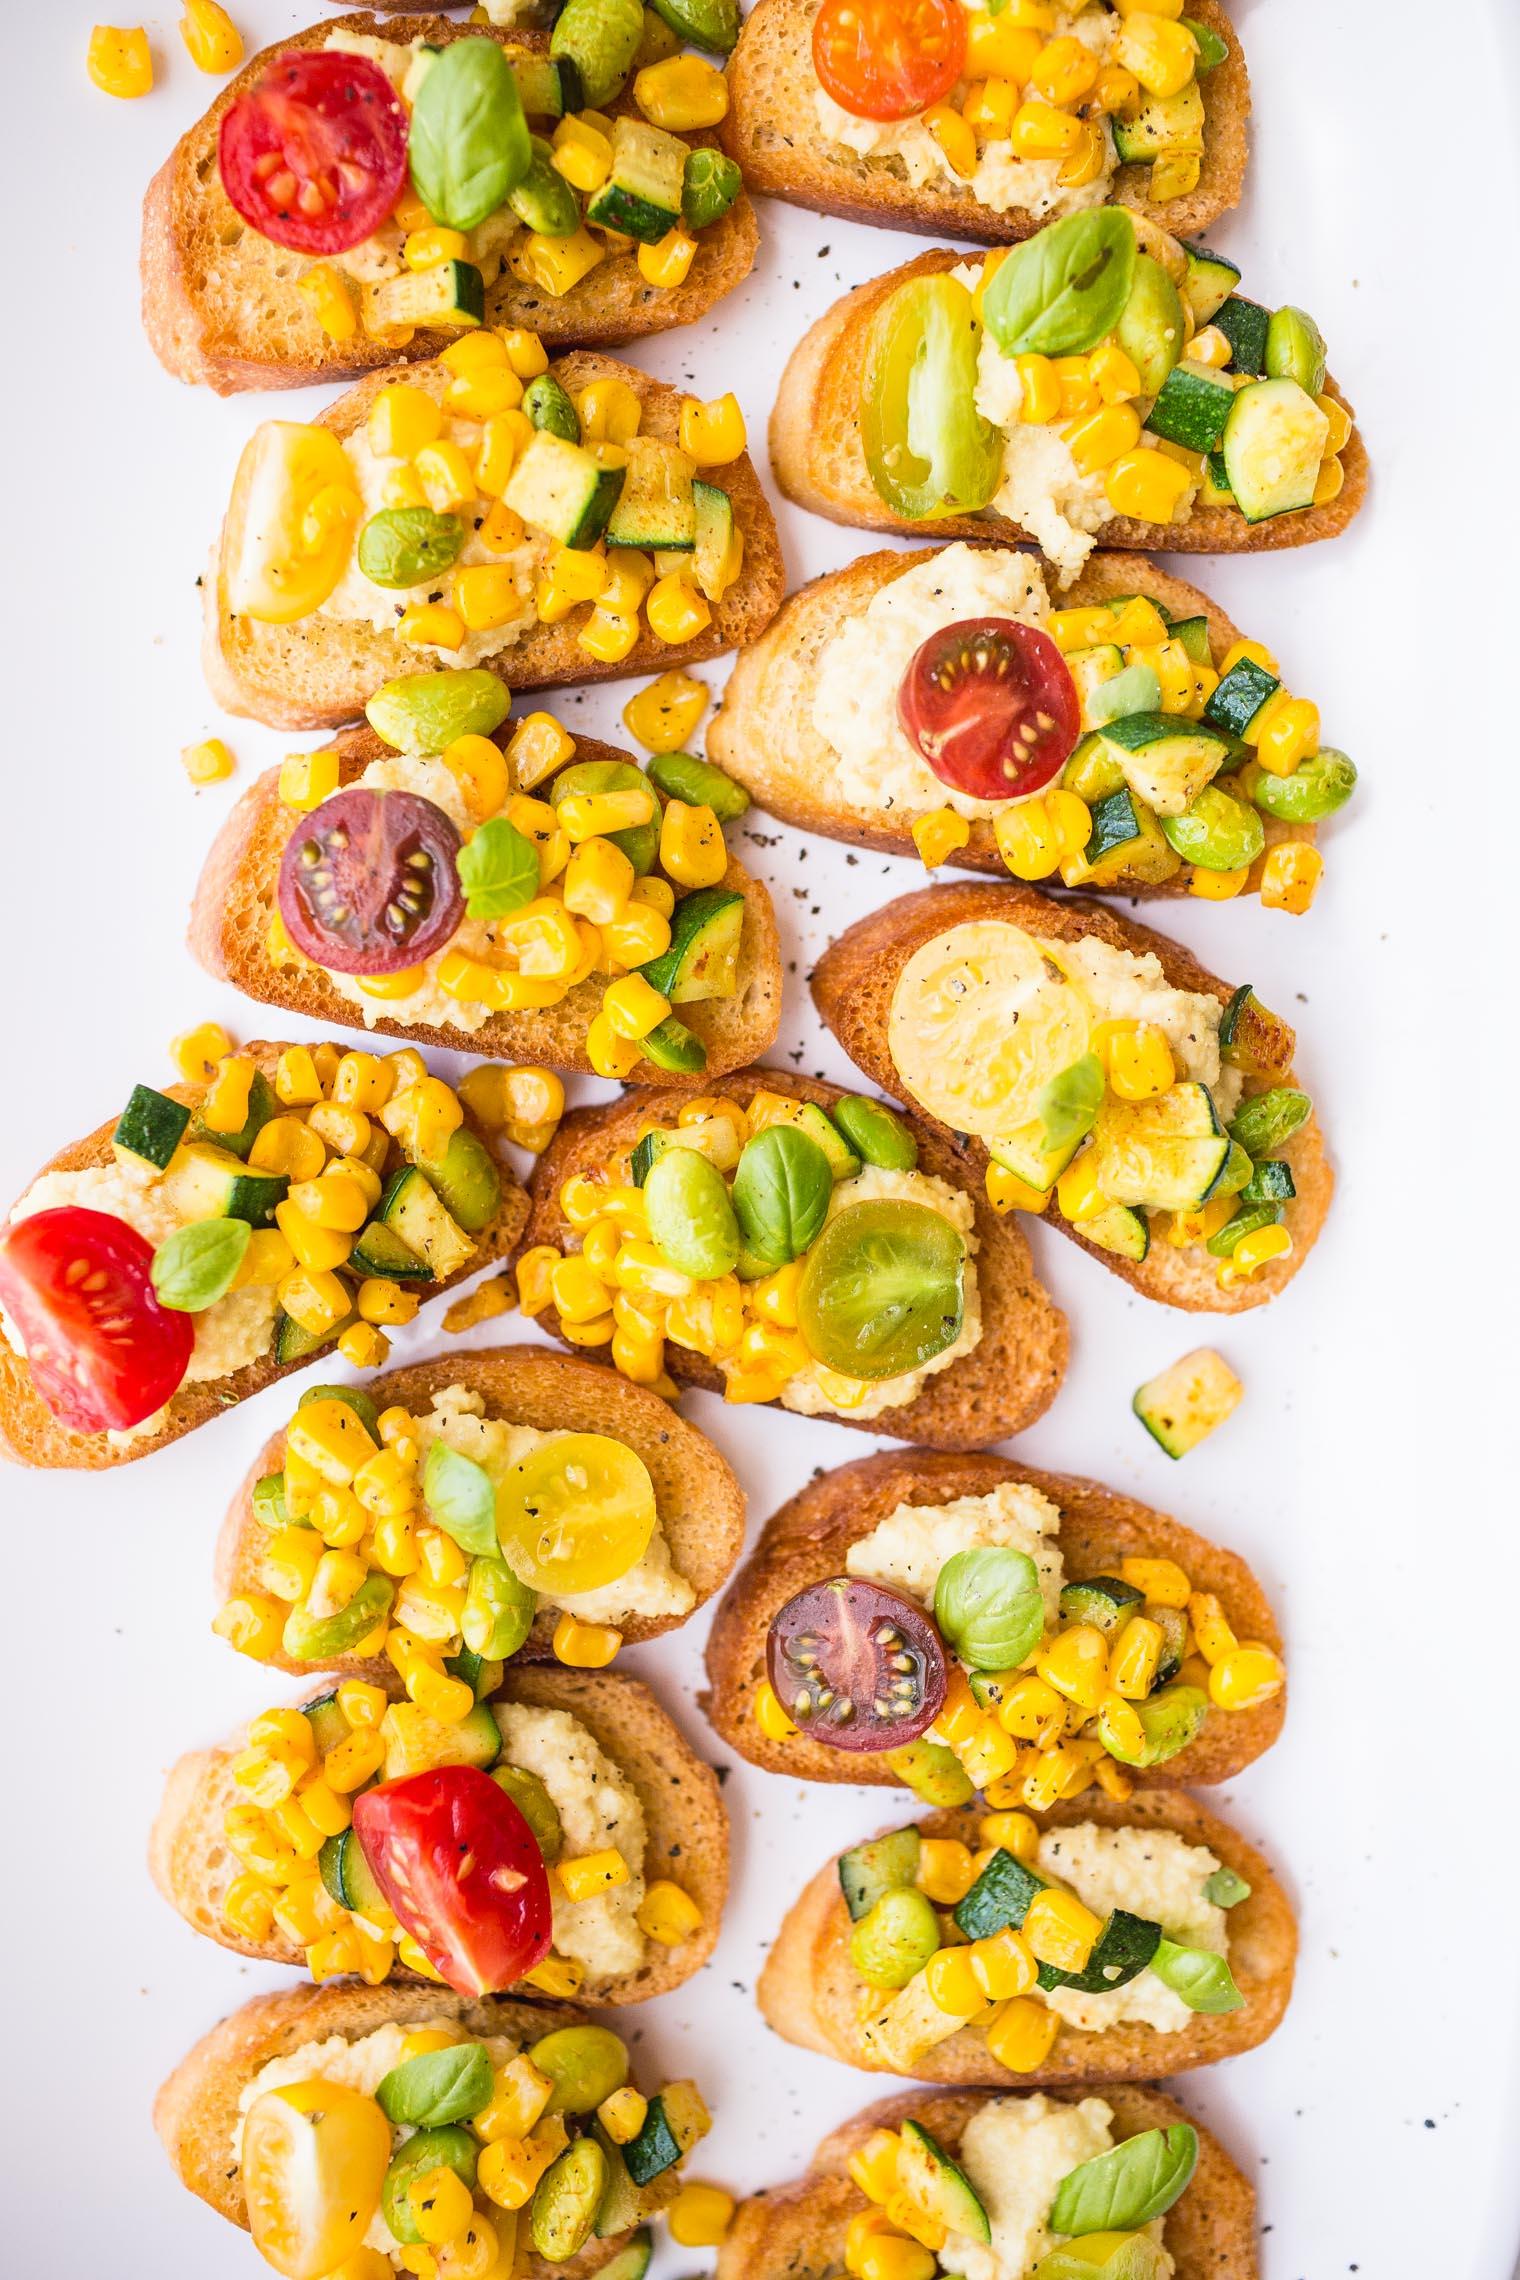 Crostini with Macadamia Ricotta and Corn-Zucchini Succotash + Vegetarian Heartland Blog Tour